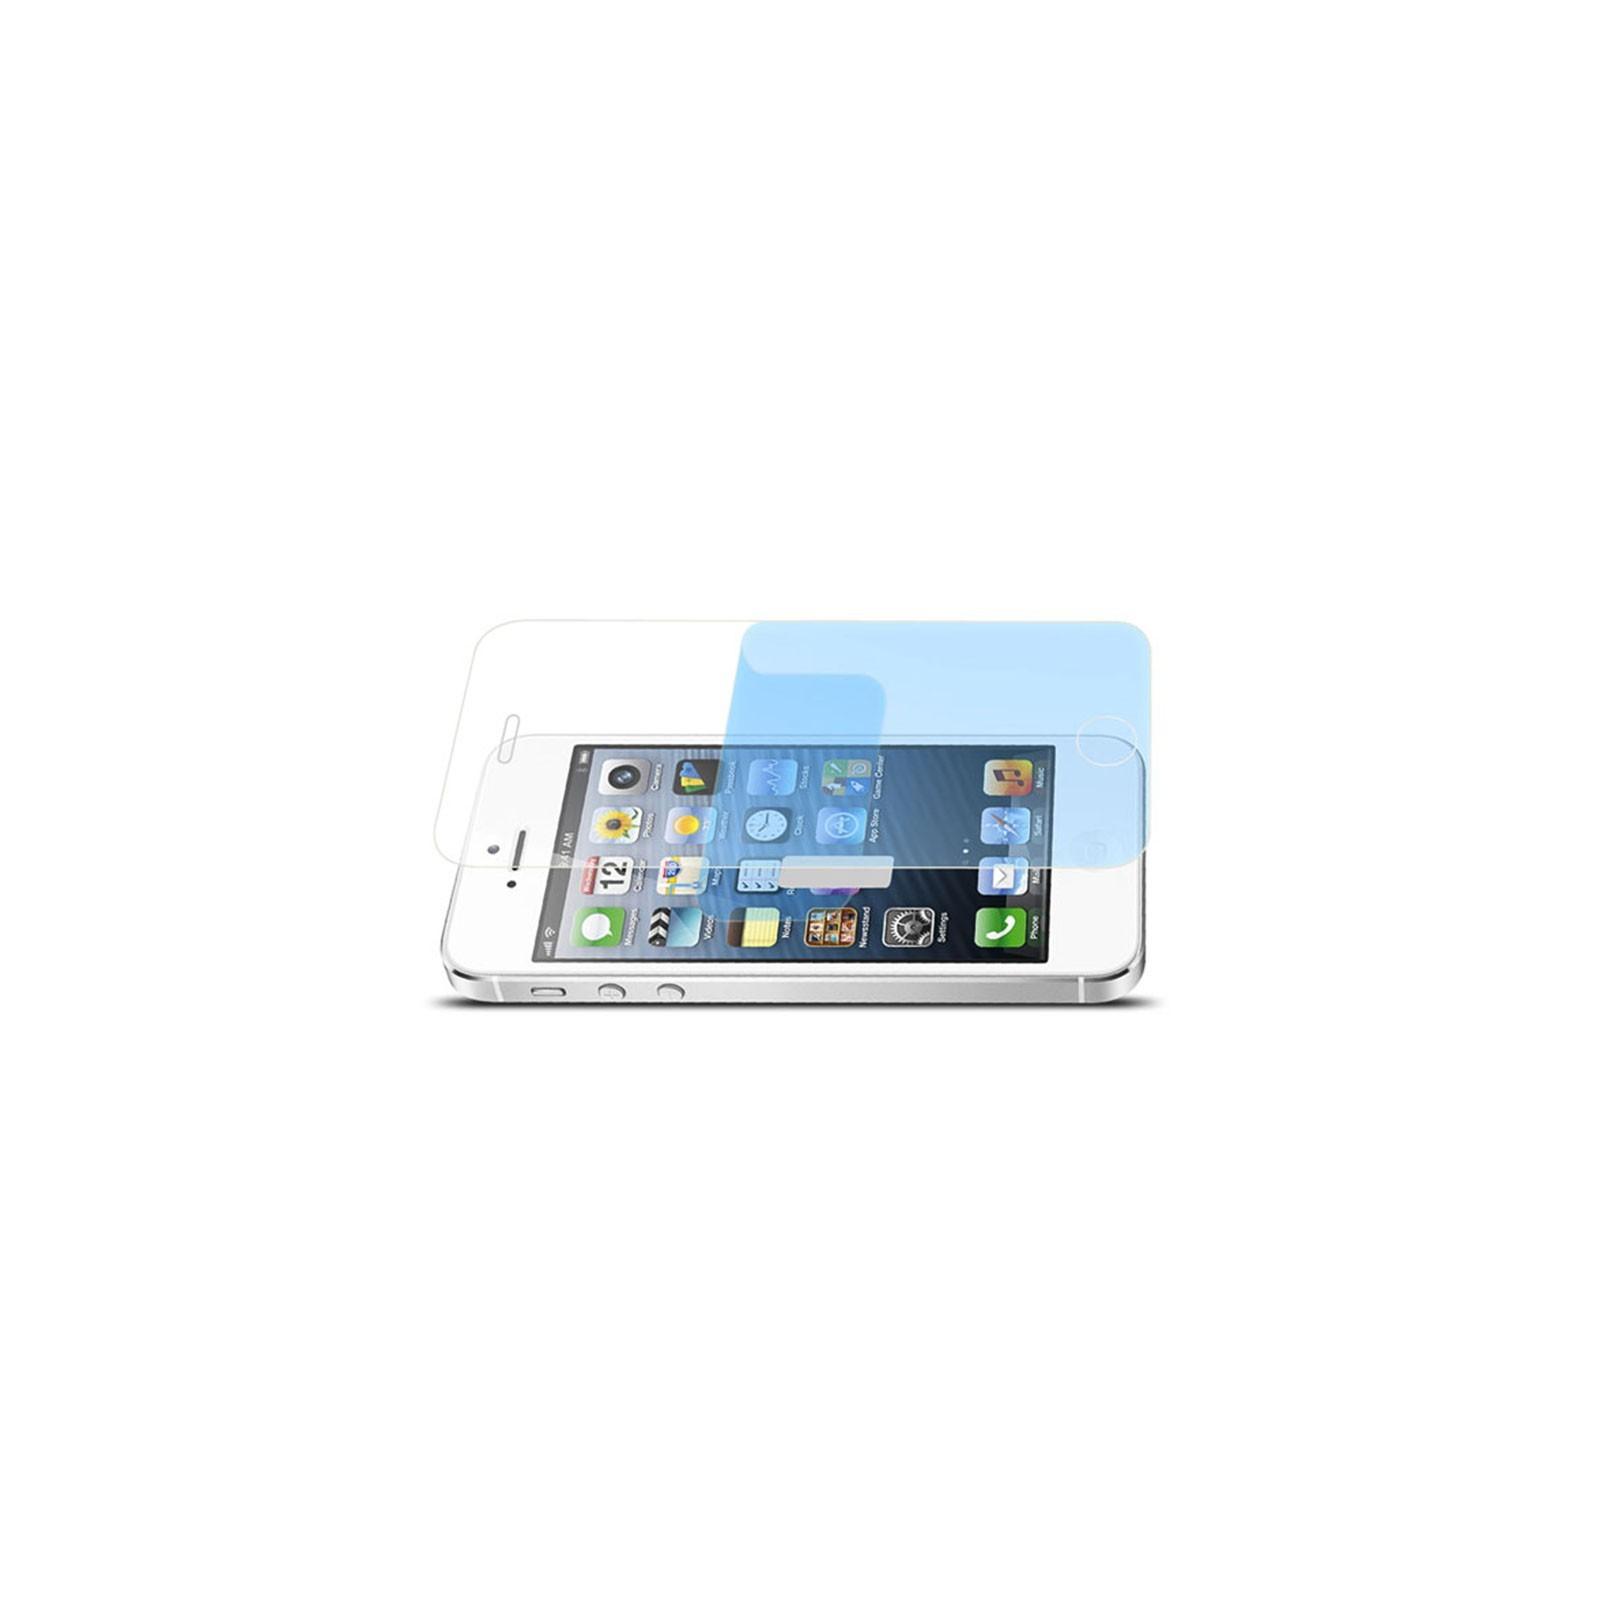 Стекло защитное JCPAL Glass Film для iPhone 5S/5C/5 (JCP3266) изображение 3